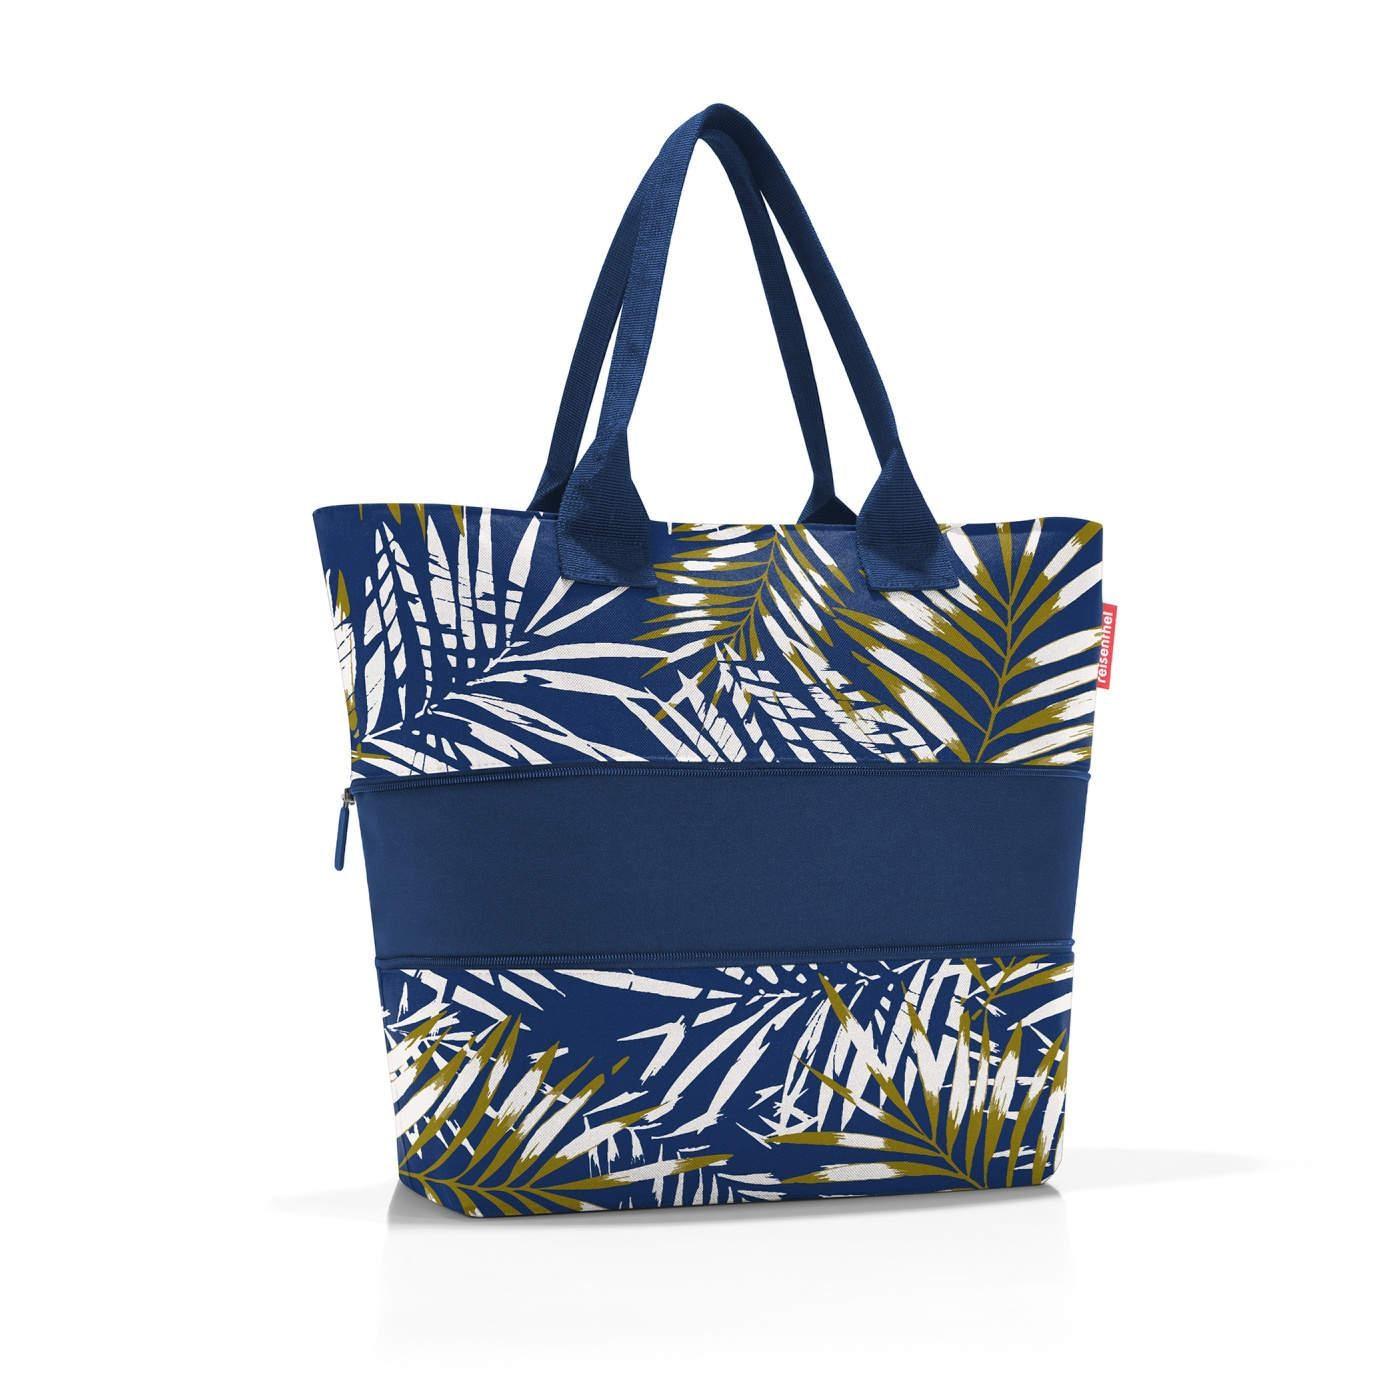 Chytrá taška přes rameno Shopper e1 jungle space blue_0